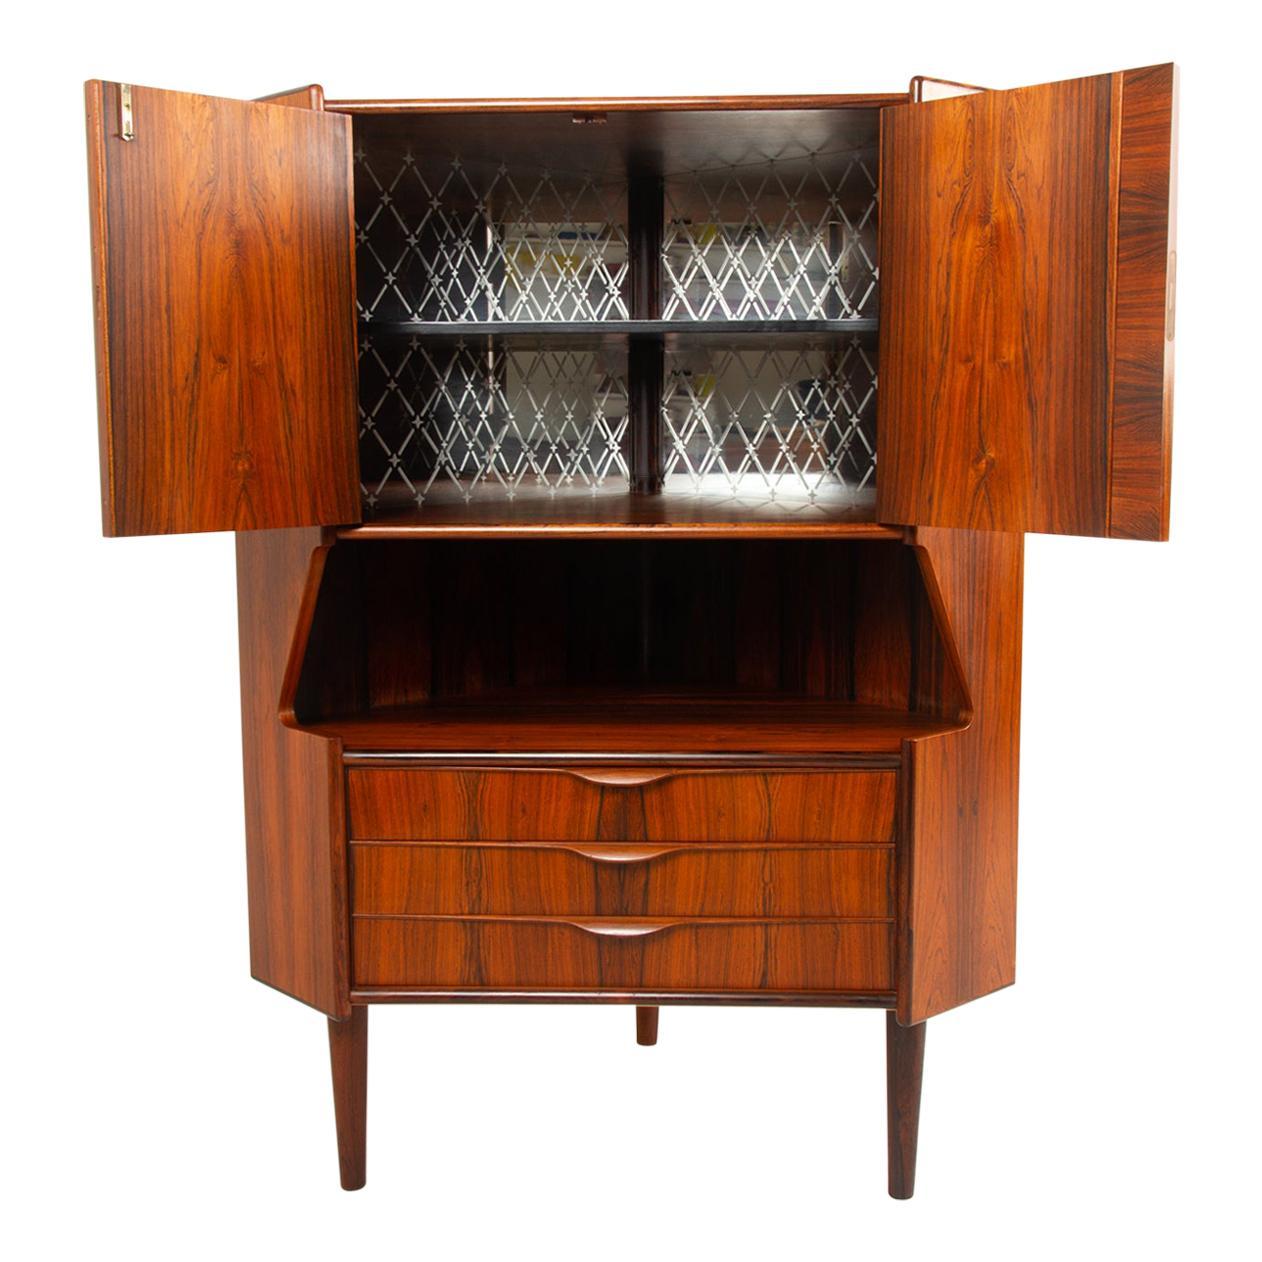 Vintage Danish Rosewood Corner Cabinet with Dry Bar, 1960s